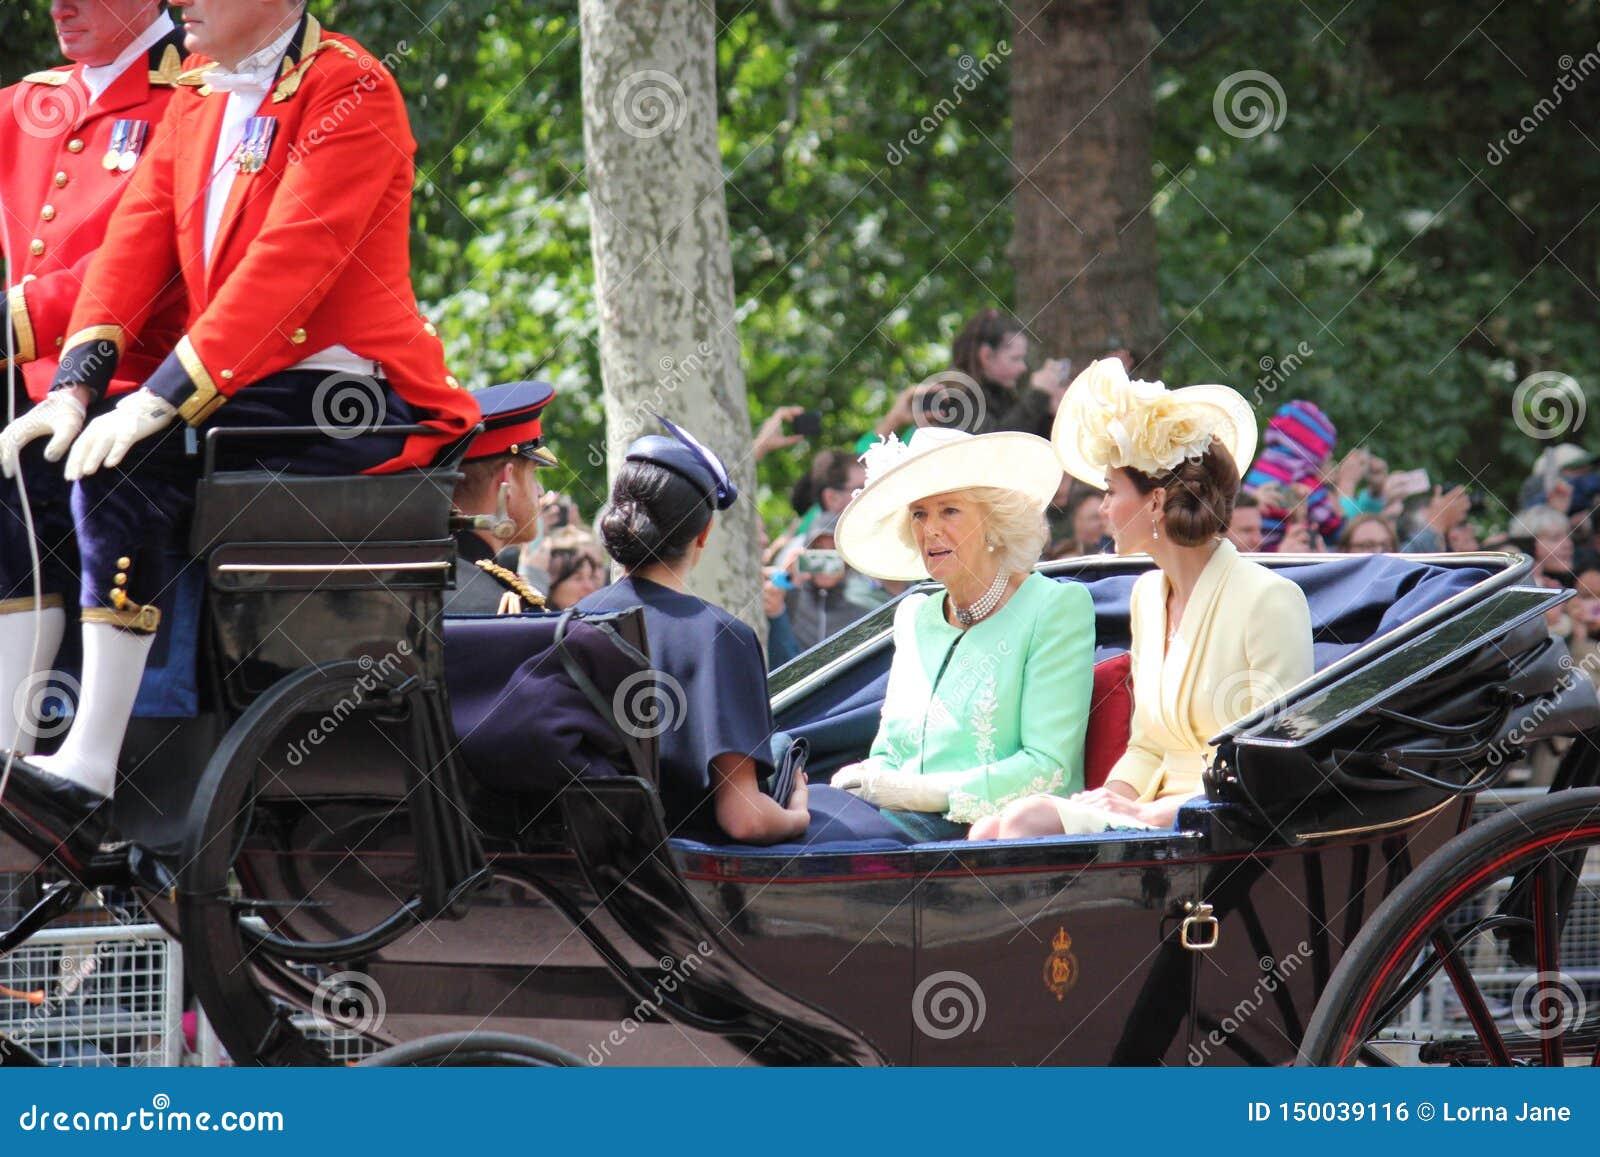 Prince Harry London R-U le 8 juin 2019 - Meghan Markle Prince Harry George William Charles Kate Middleton